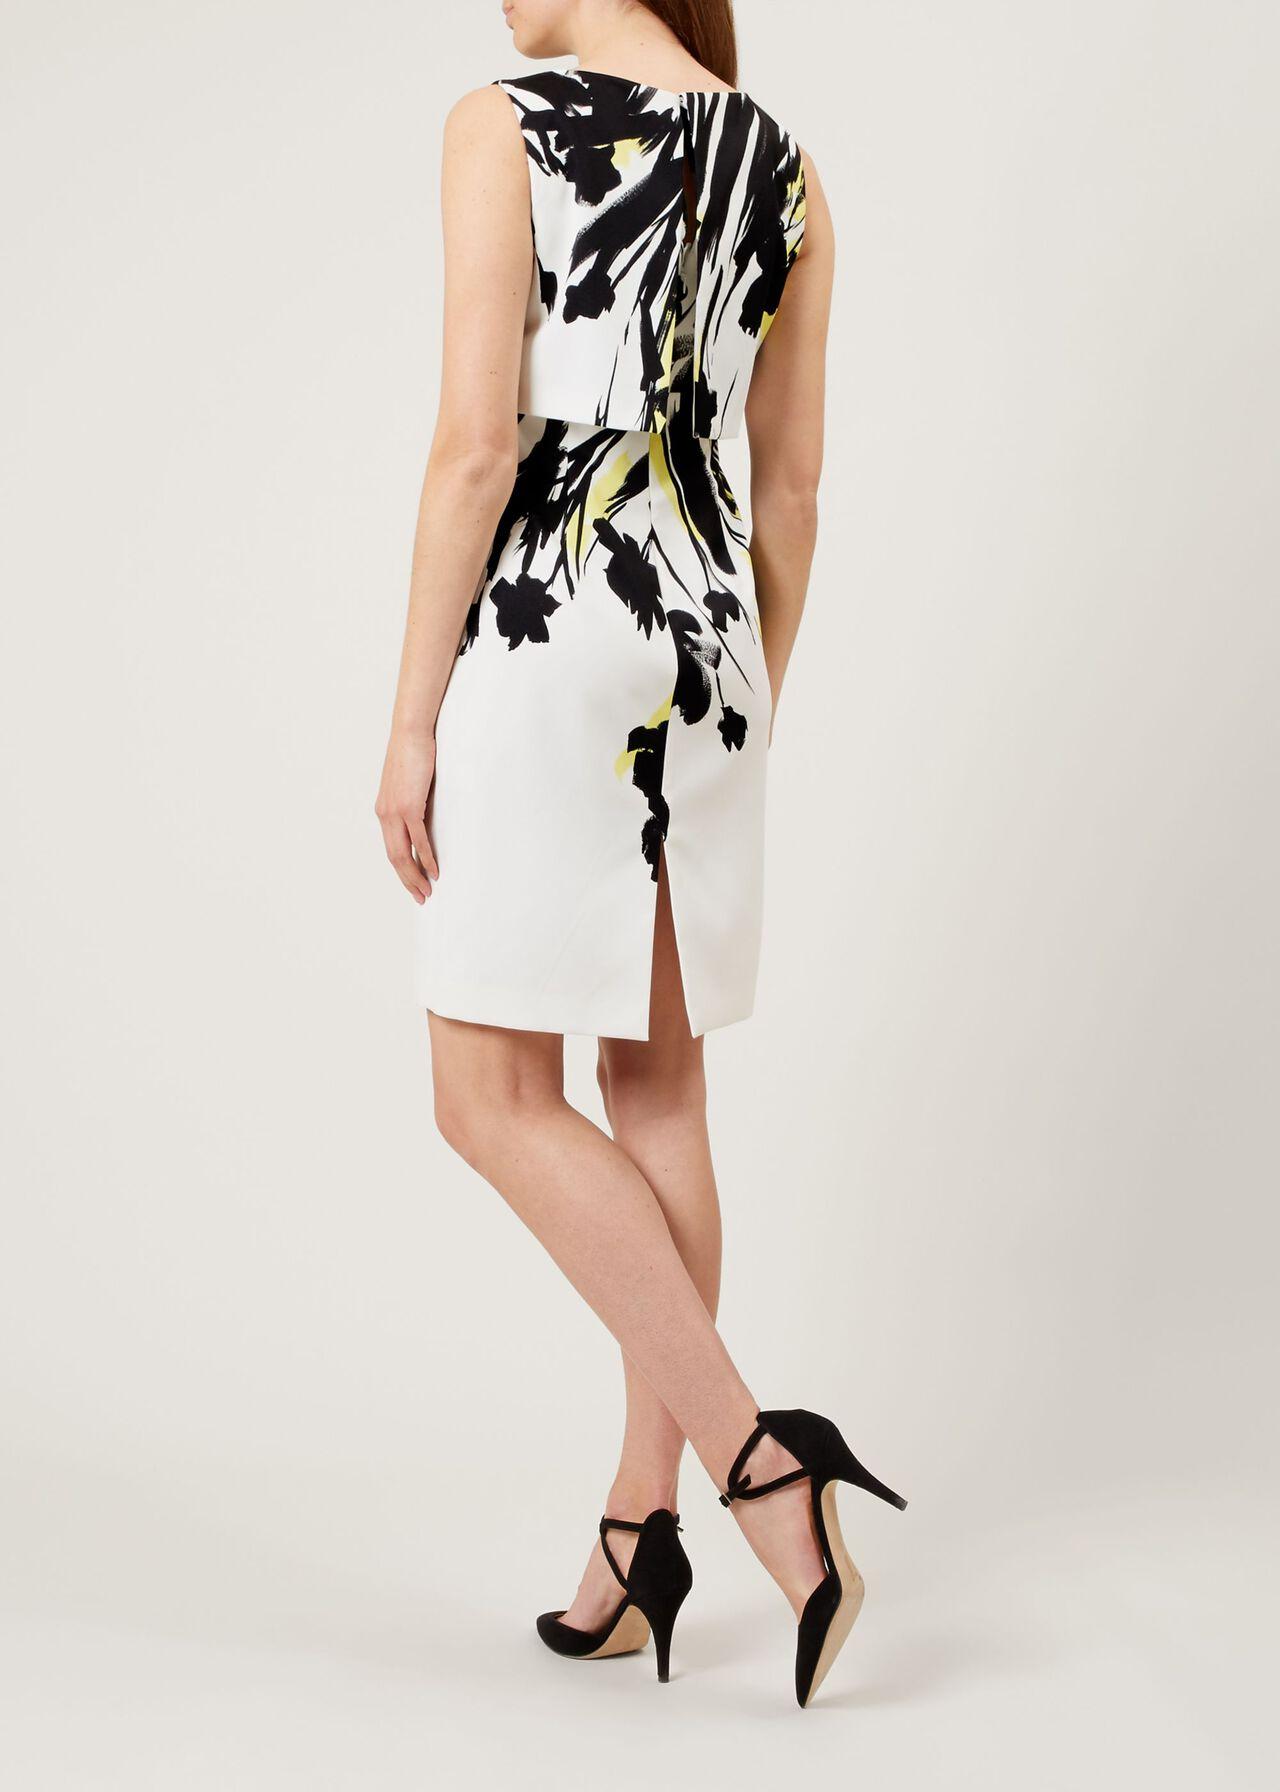 Bree Dress Ivory Multi